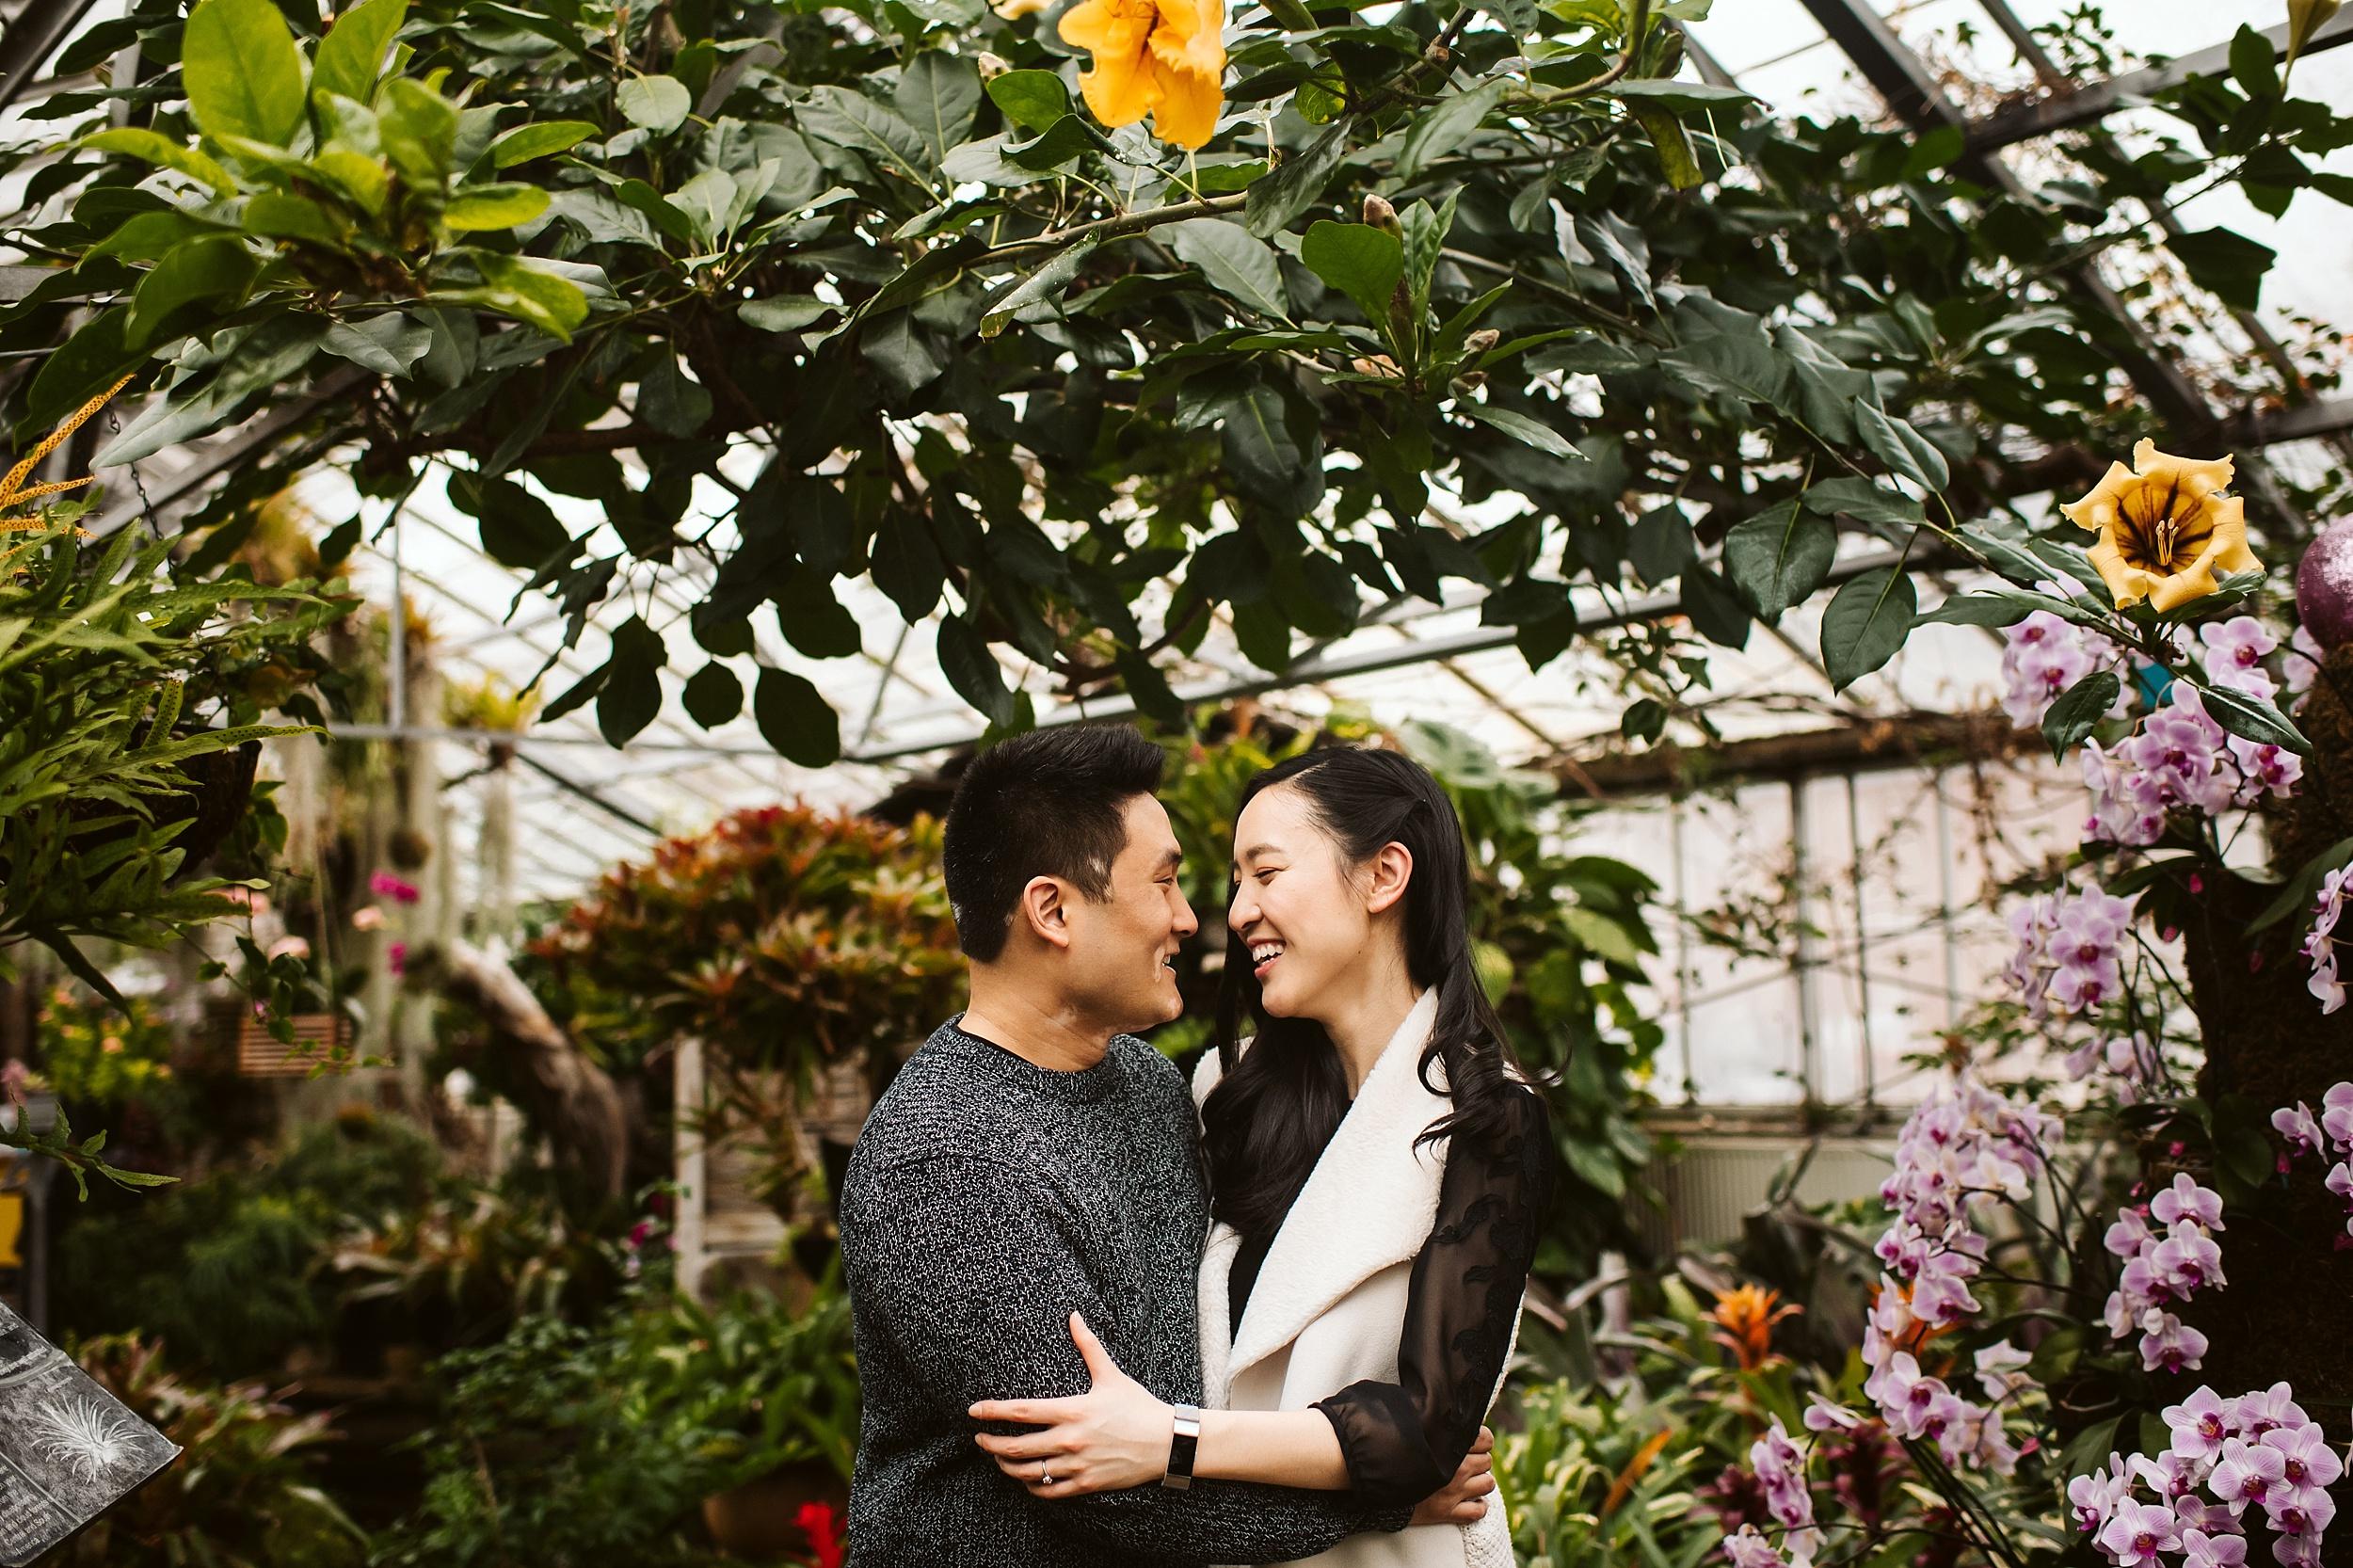 Allan_Gardens_Engagement_Shoot_Toronto_Wedding_Photographer_0007.jpg